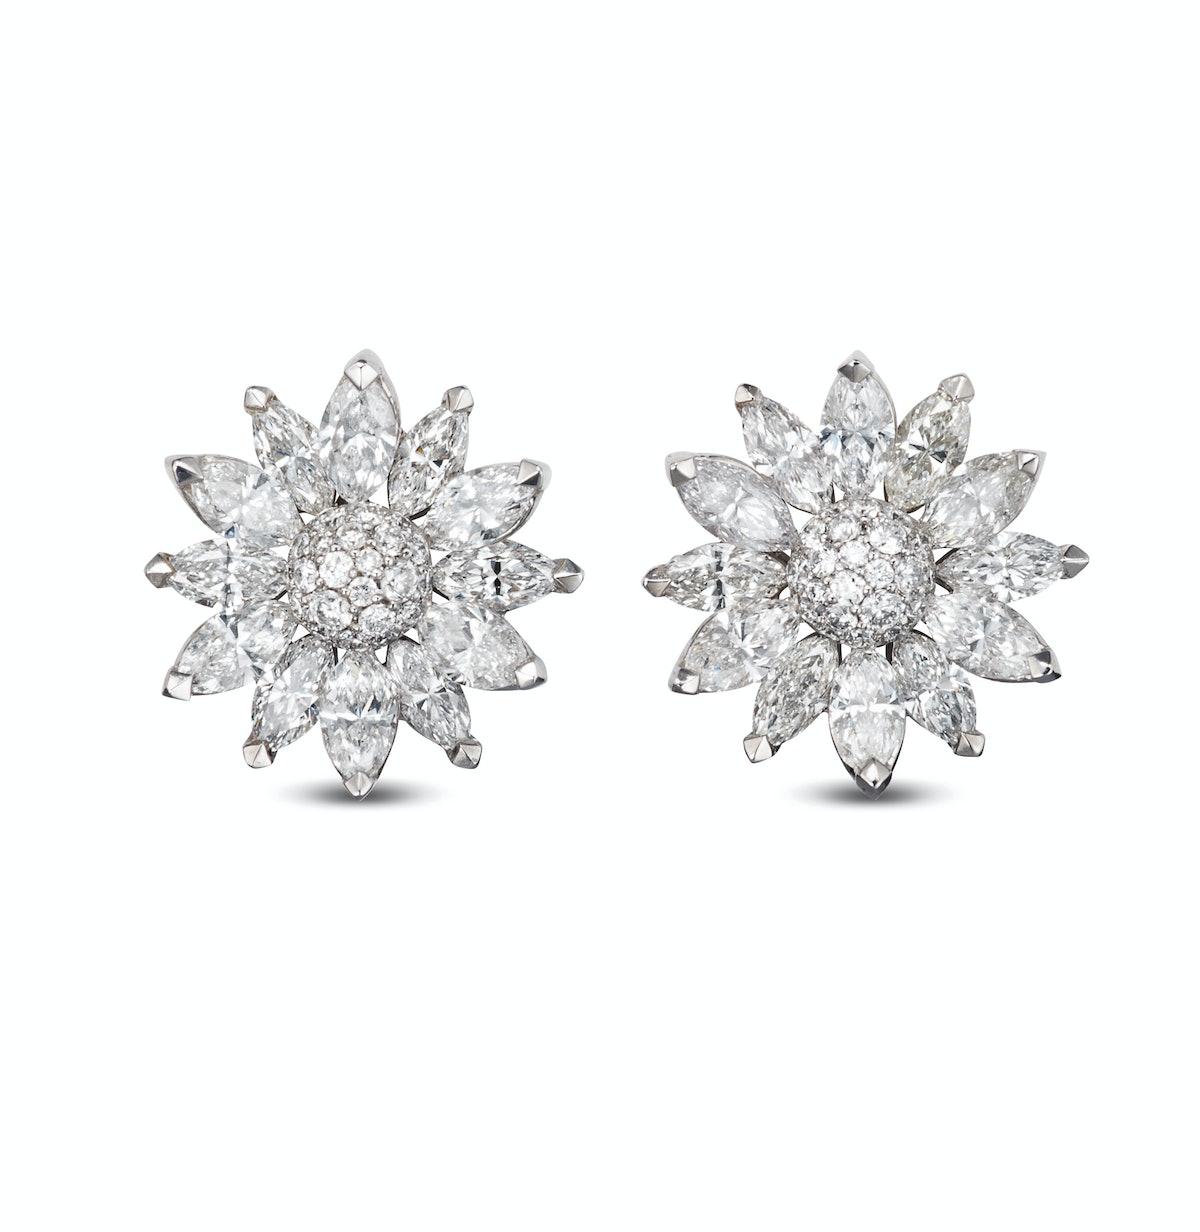 Asprey gold and diamond earrings